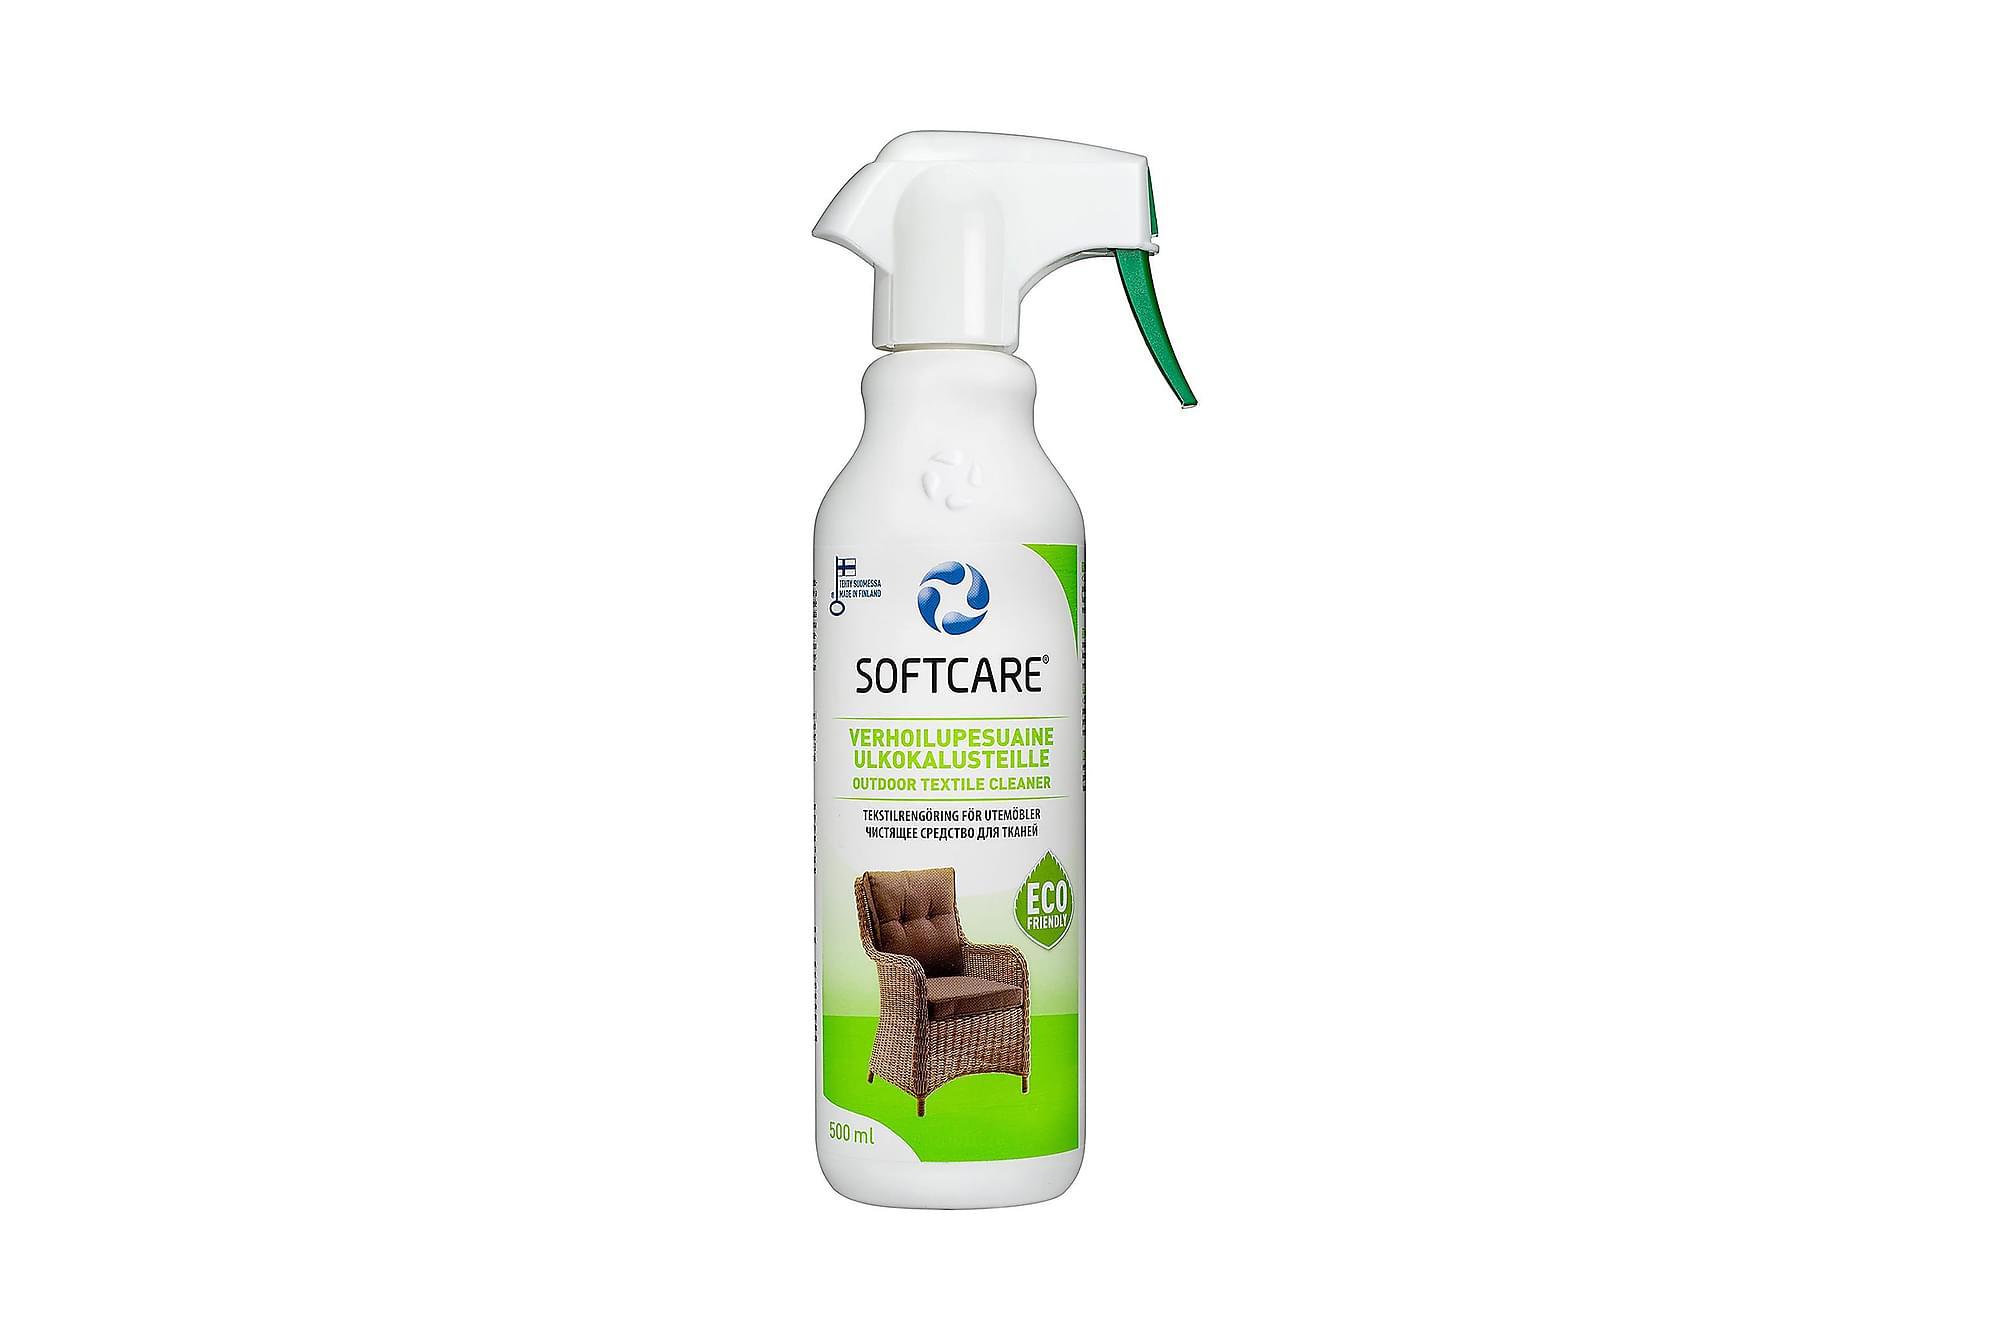 SOFTCARE Rengöringsmedel för utomhustextilier